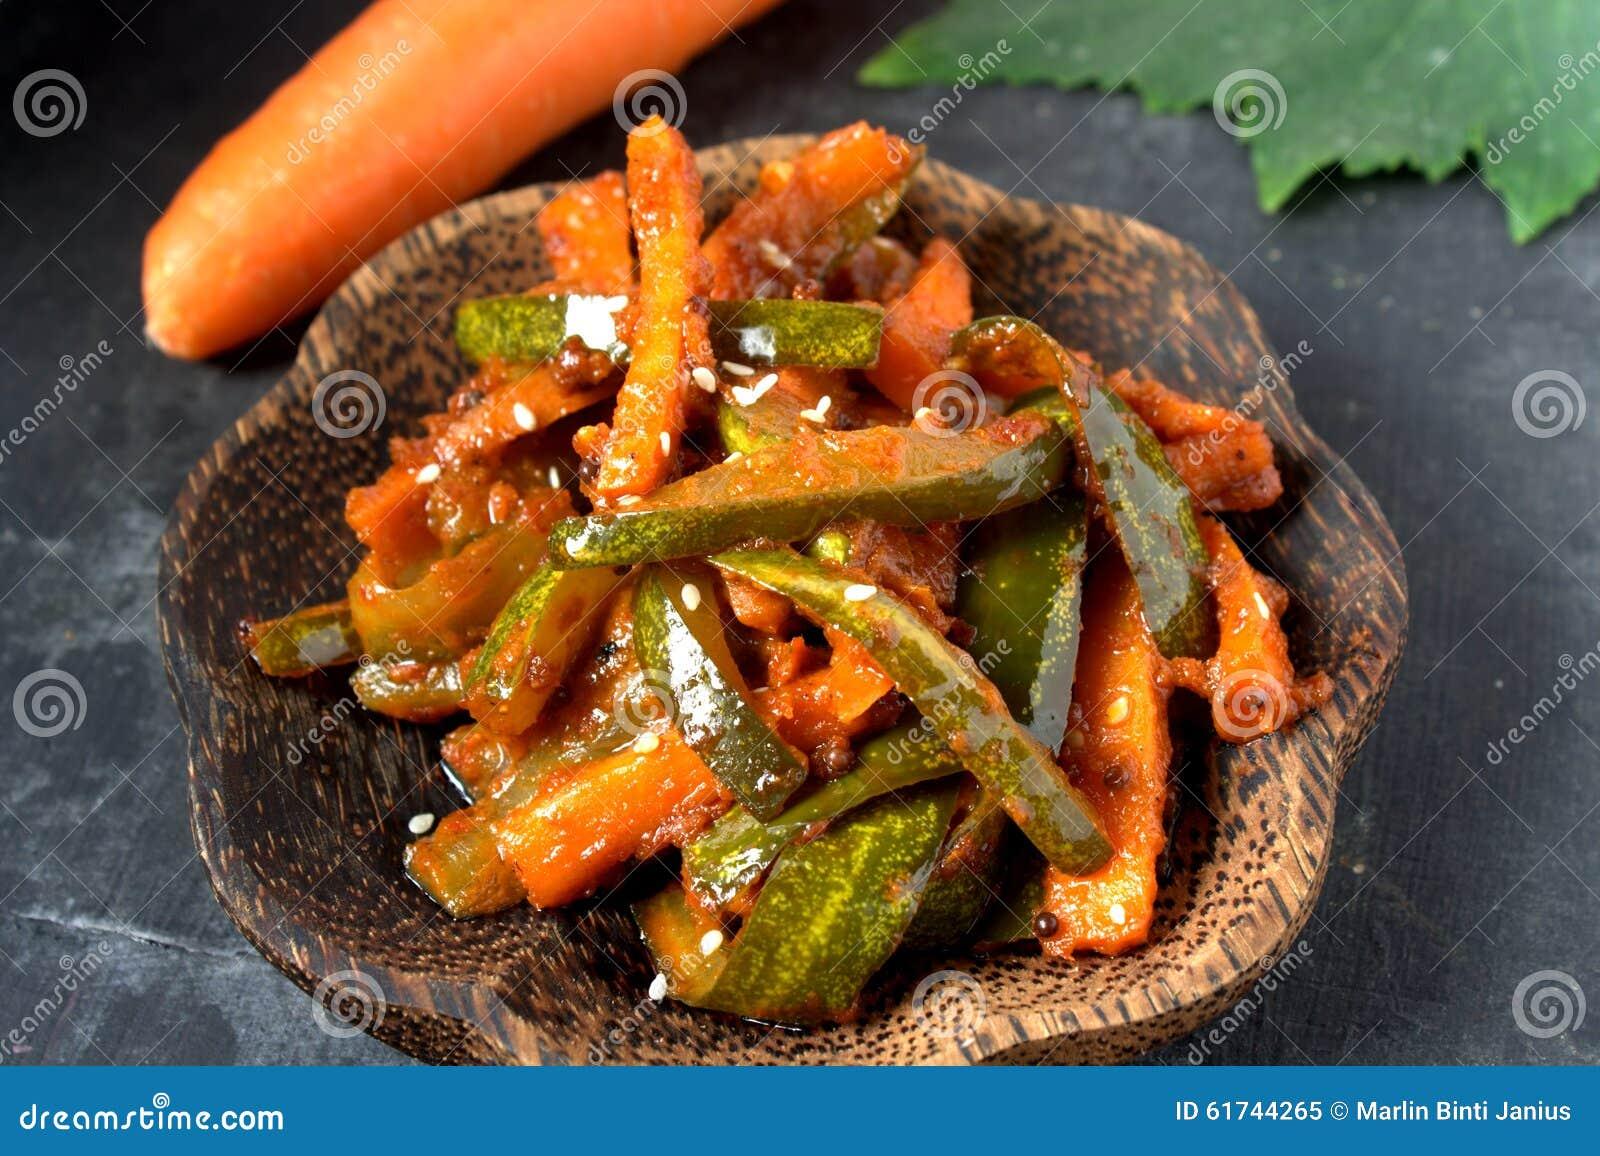 Nature S Table Vegetarian Chili